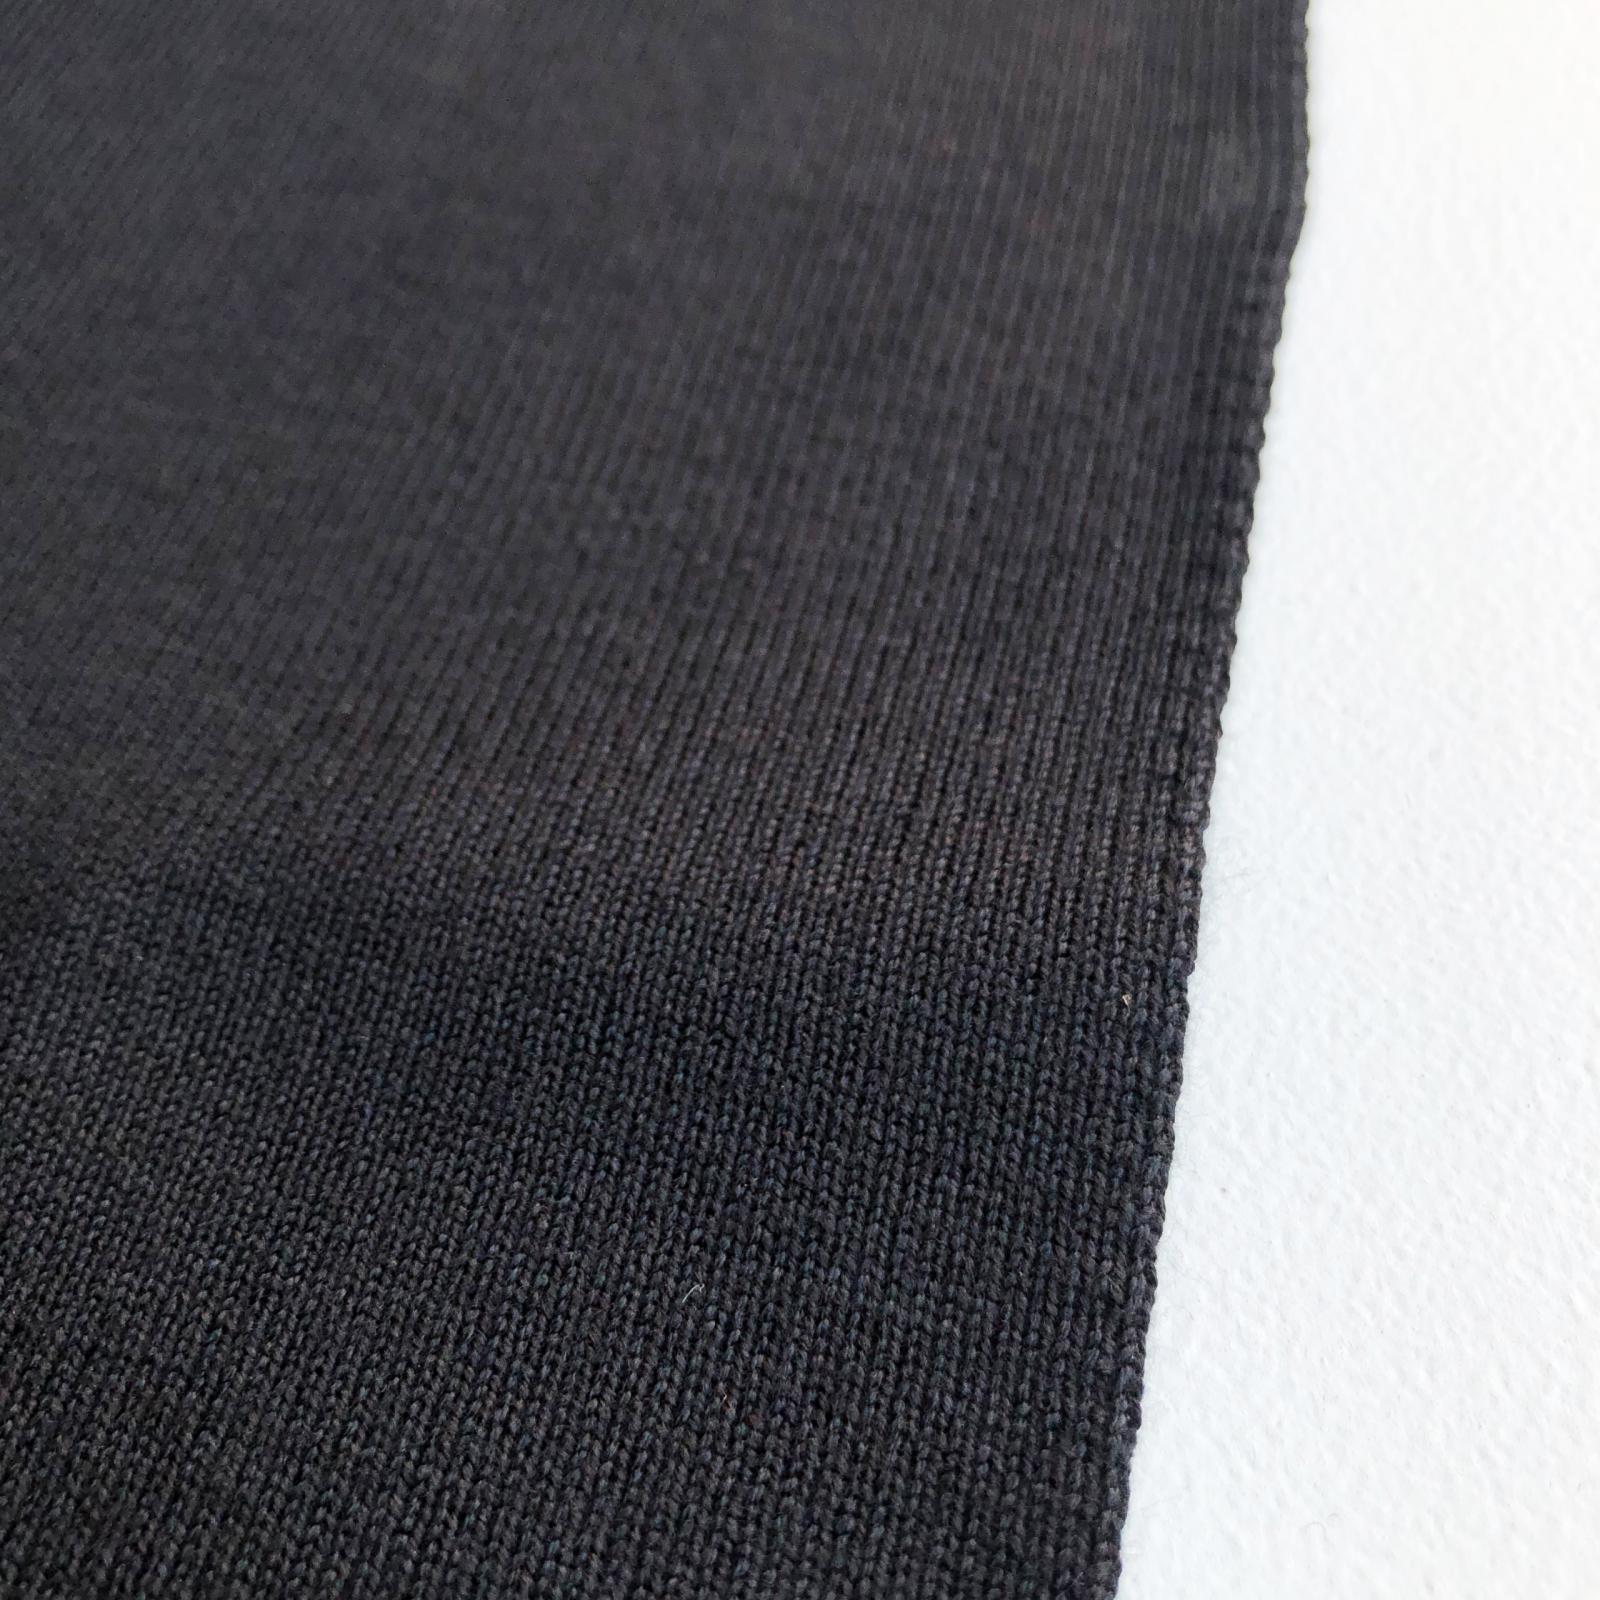 Designer Deadstock 1x1 Spun Rayon Heavyweight Sweatshirt Rib Knit - Black 36